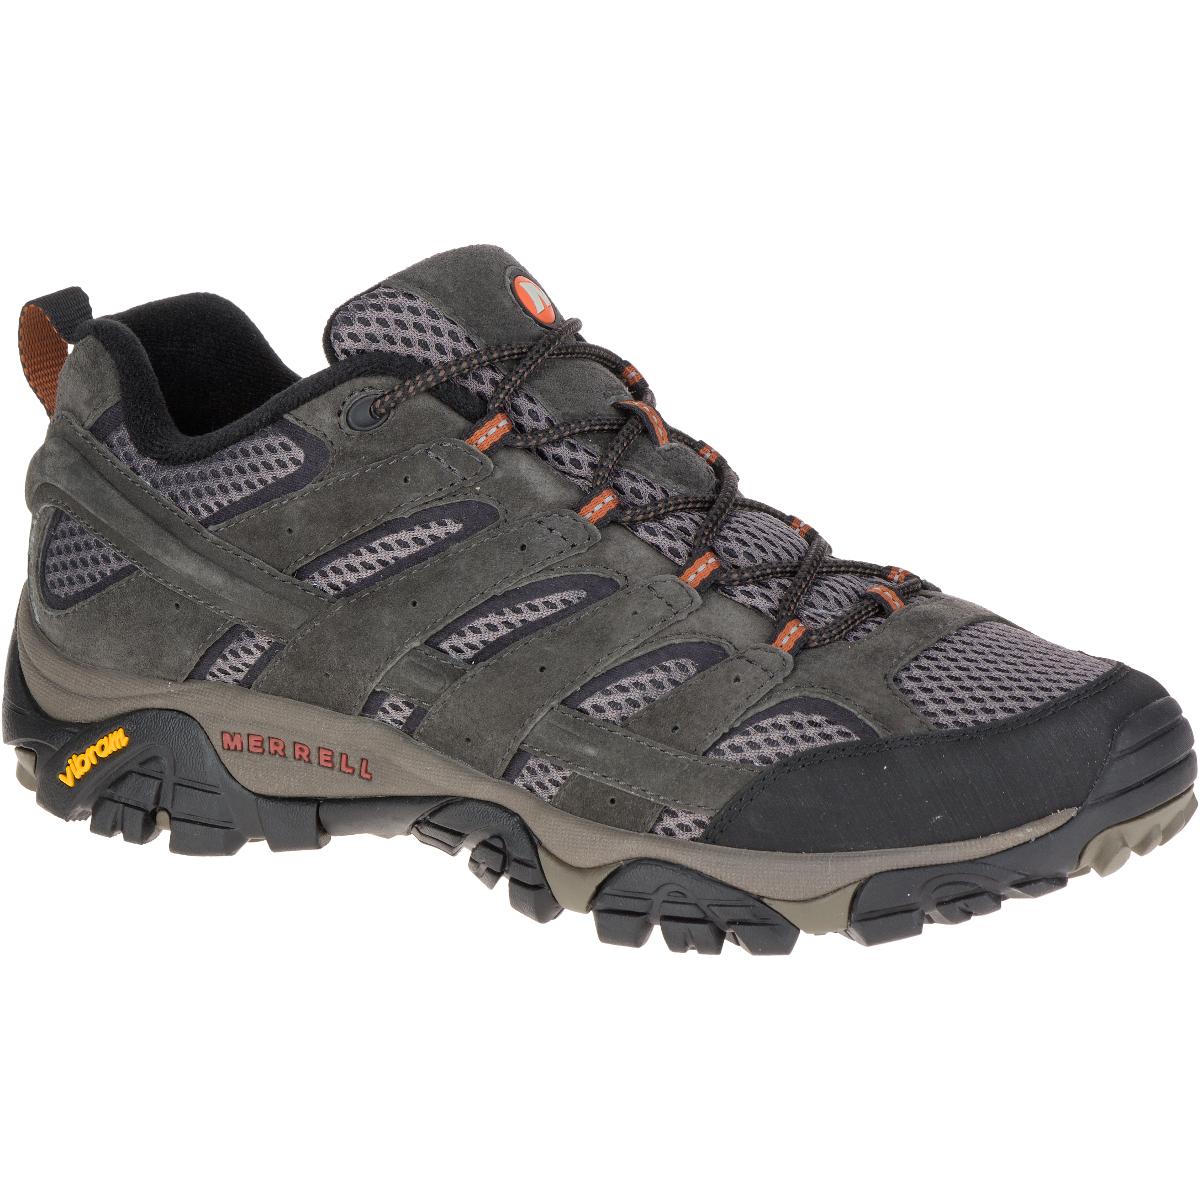 Merrell Men's Moab 2 Ventilator Hiking Shoes, Beluga - Black, 14